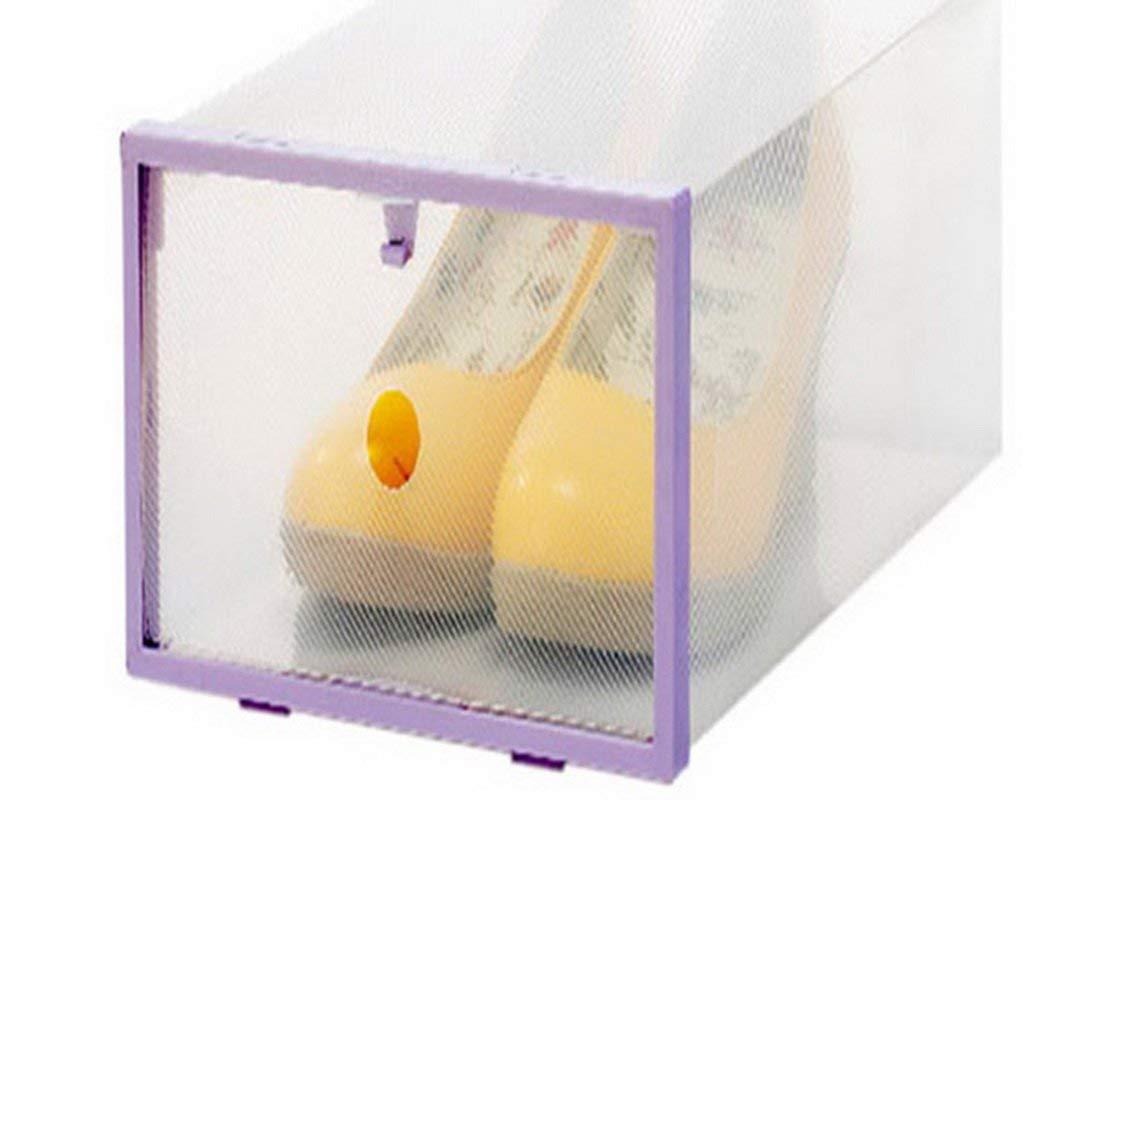 Fengg2030shann Transparent Shoebox Plastic Put Shoes Shoe Storage Box  Drawer Housing Simple Shoebox Son. Box